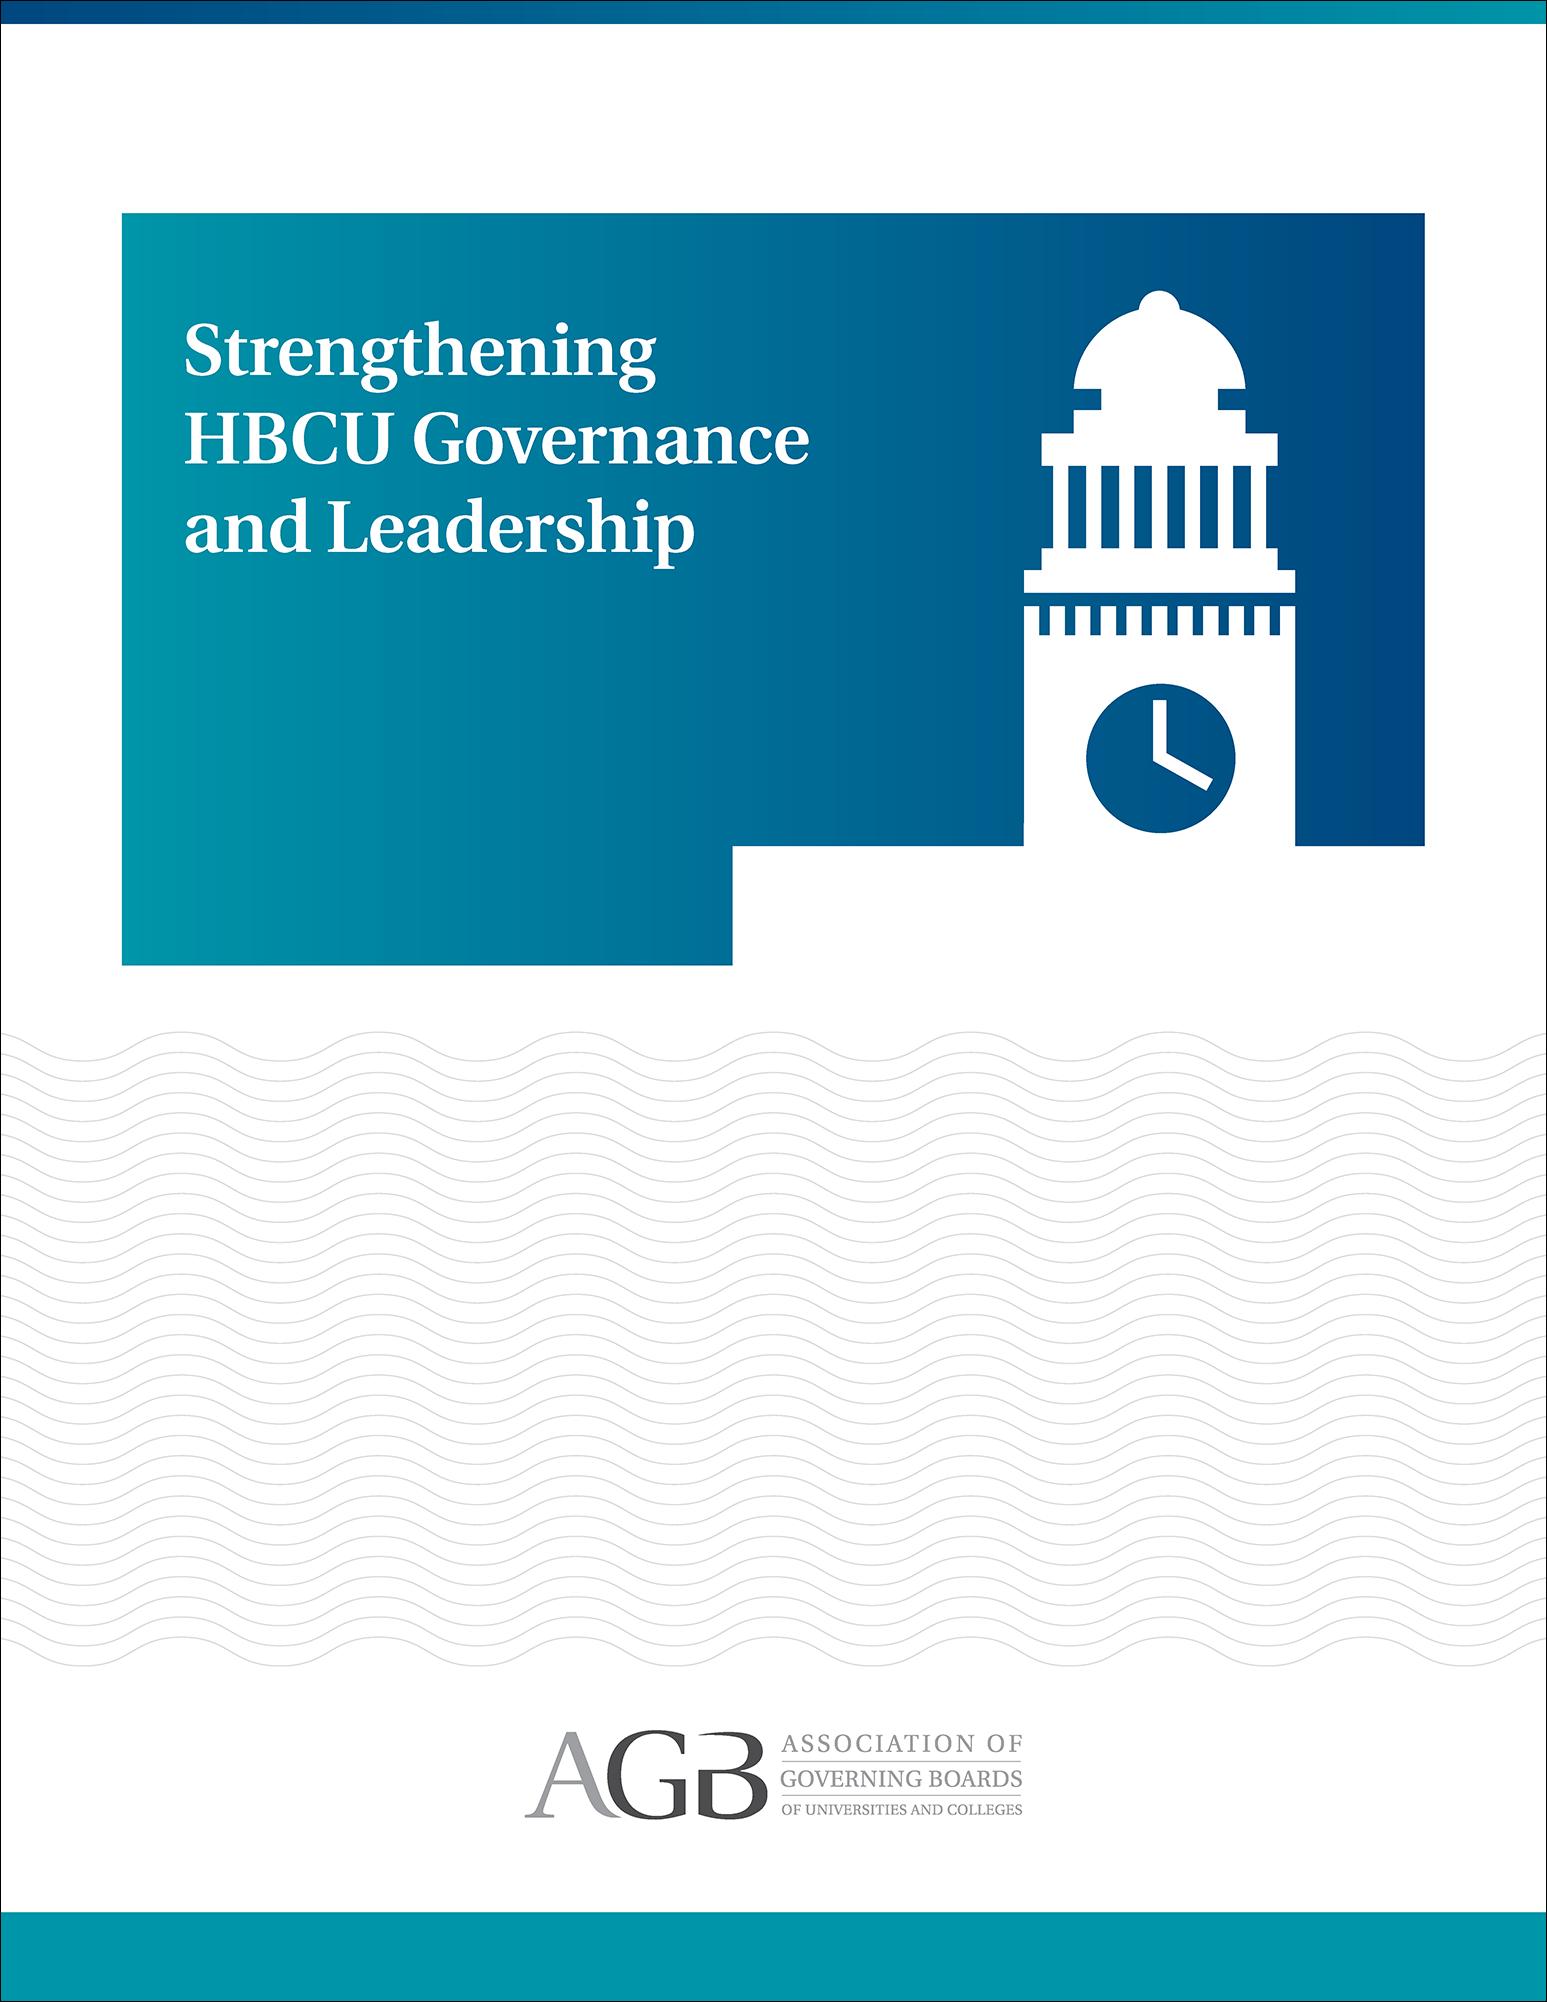 Strengthening HBCU Governance and Leadership